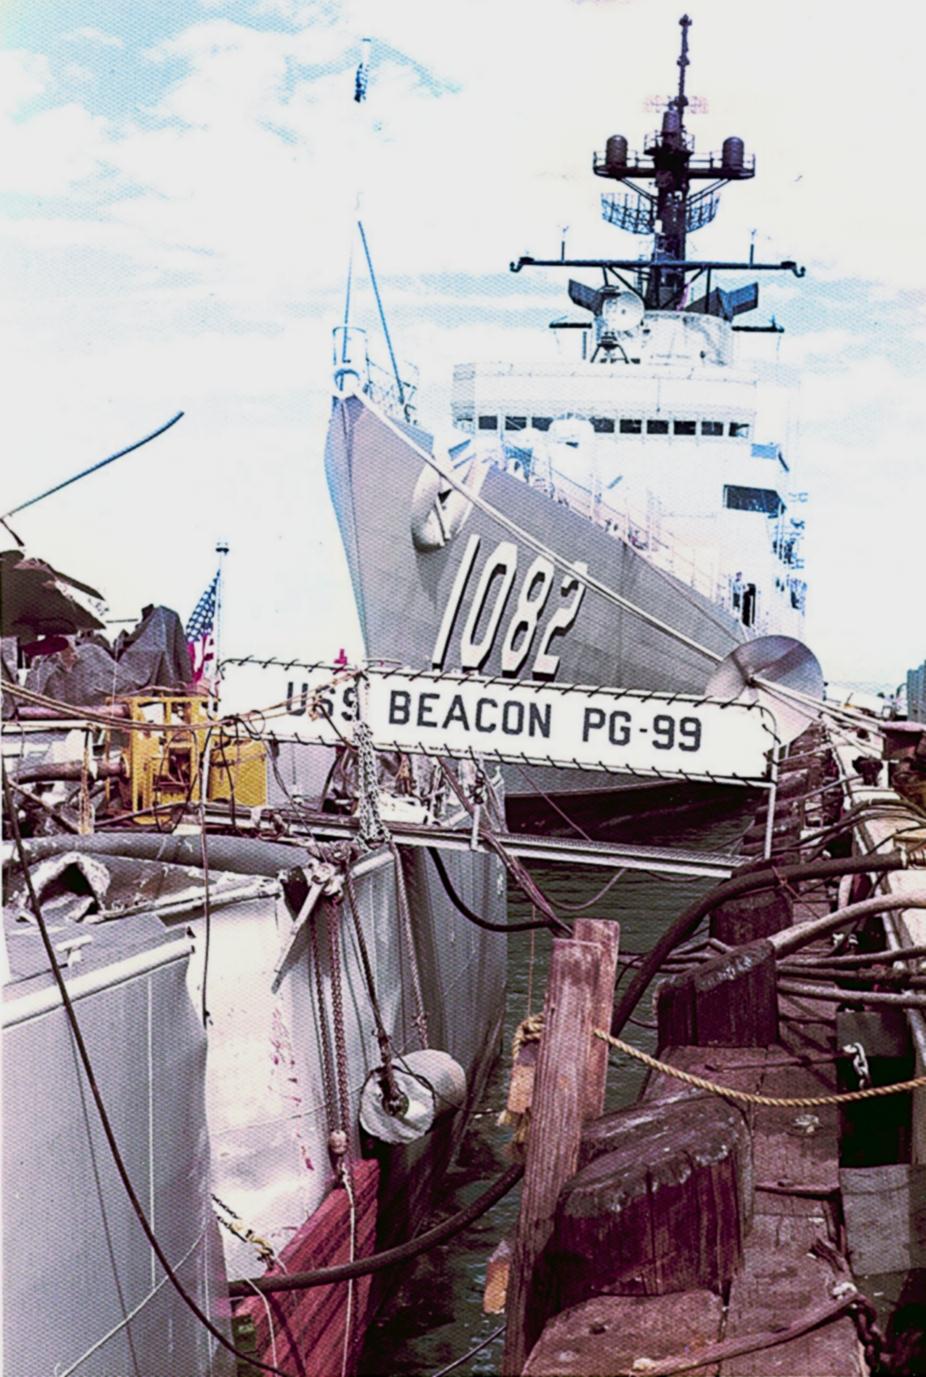 Cargo Ship Engine Room: USS Beacon (PG-99)